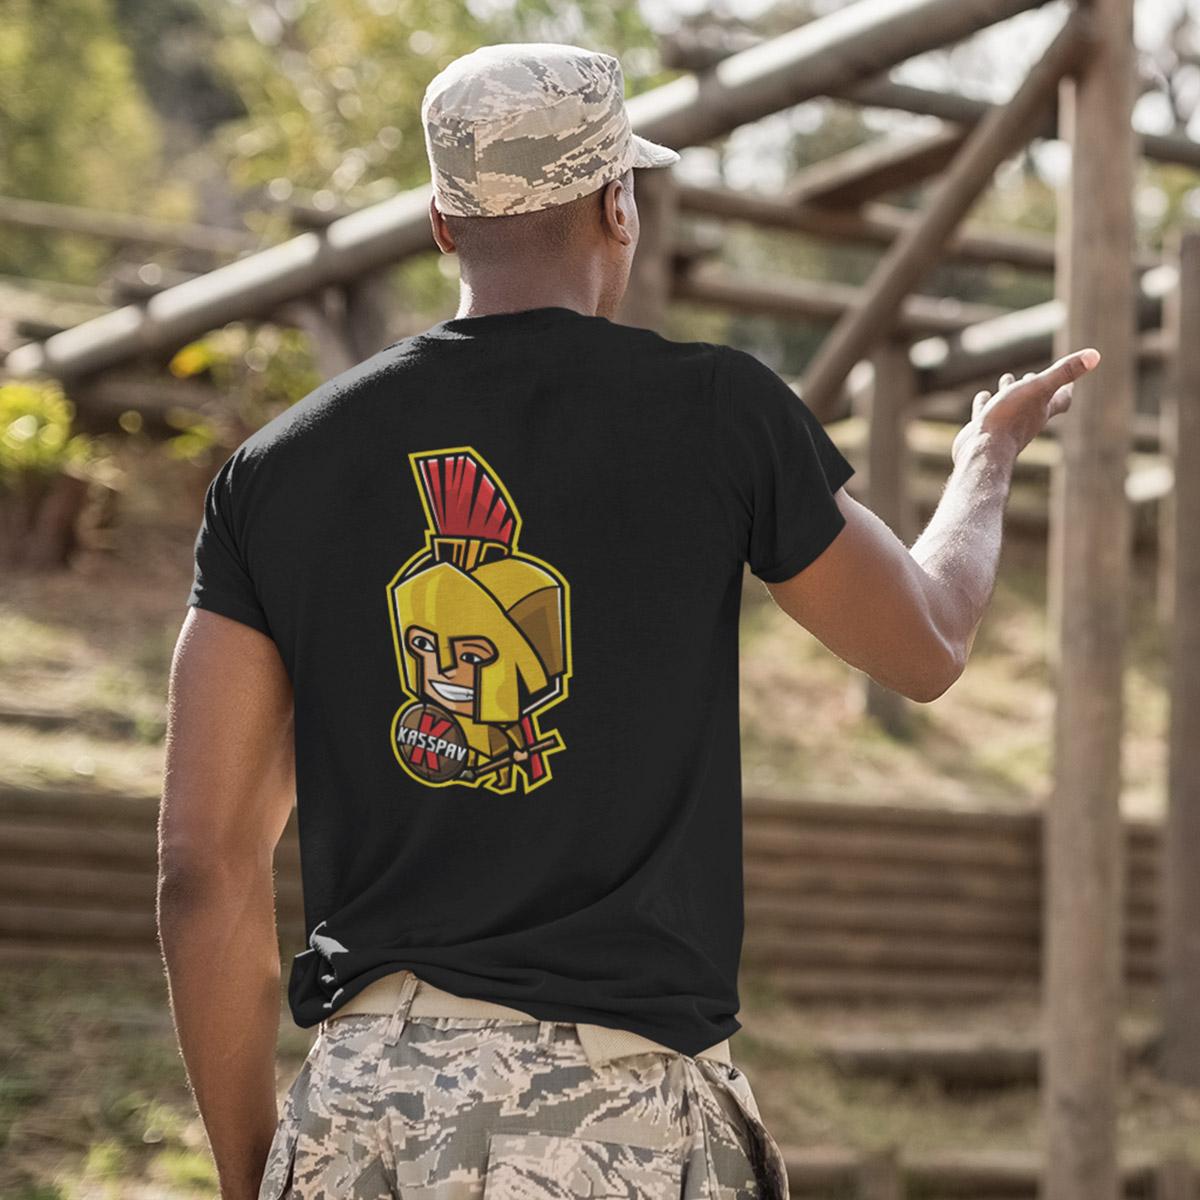 Kasspav-Spartan-Extreme-T-Shirt-1.jpg